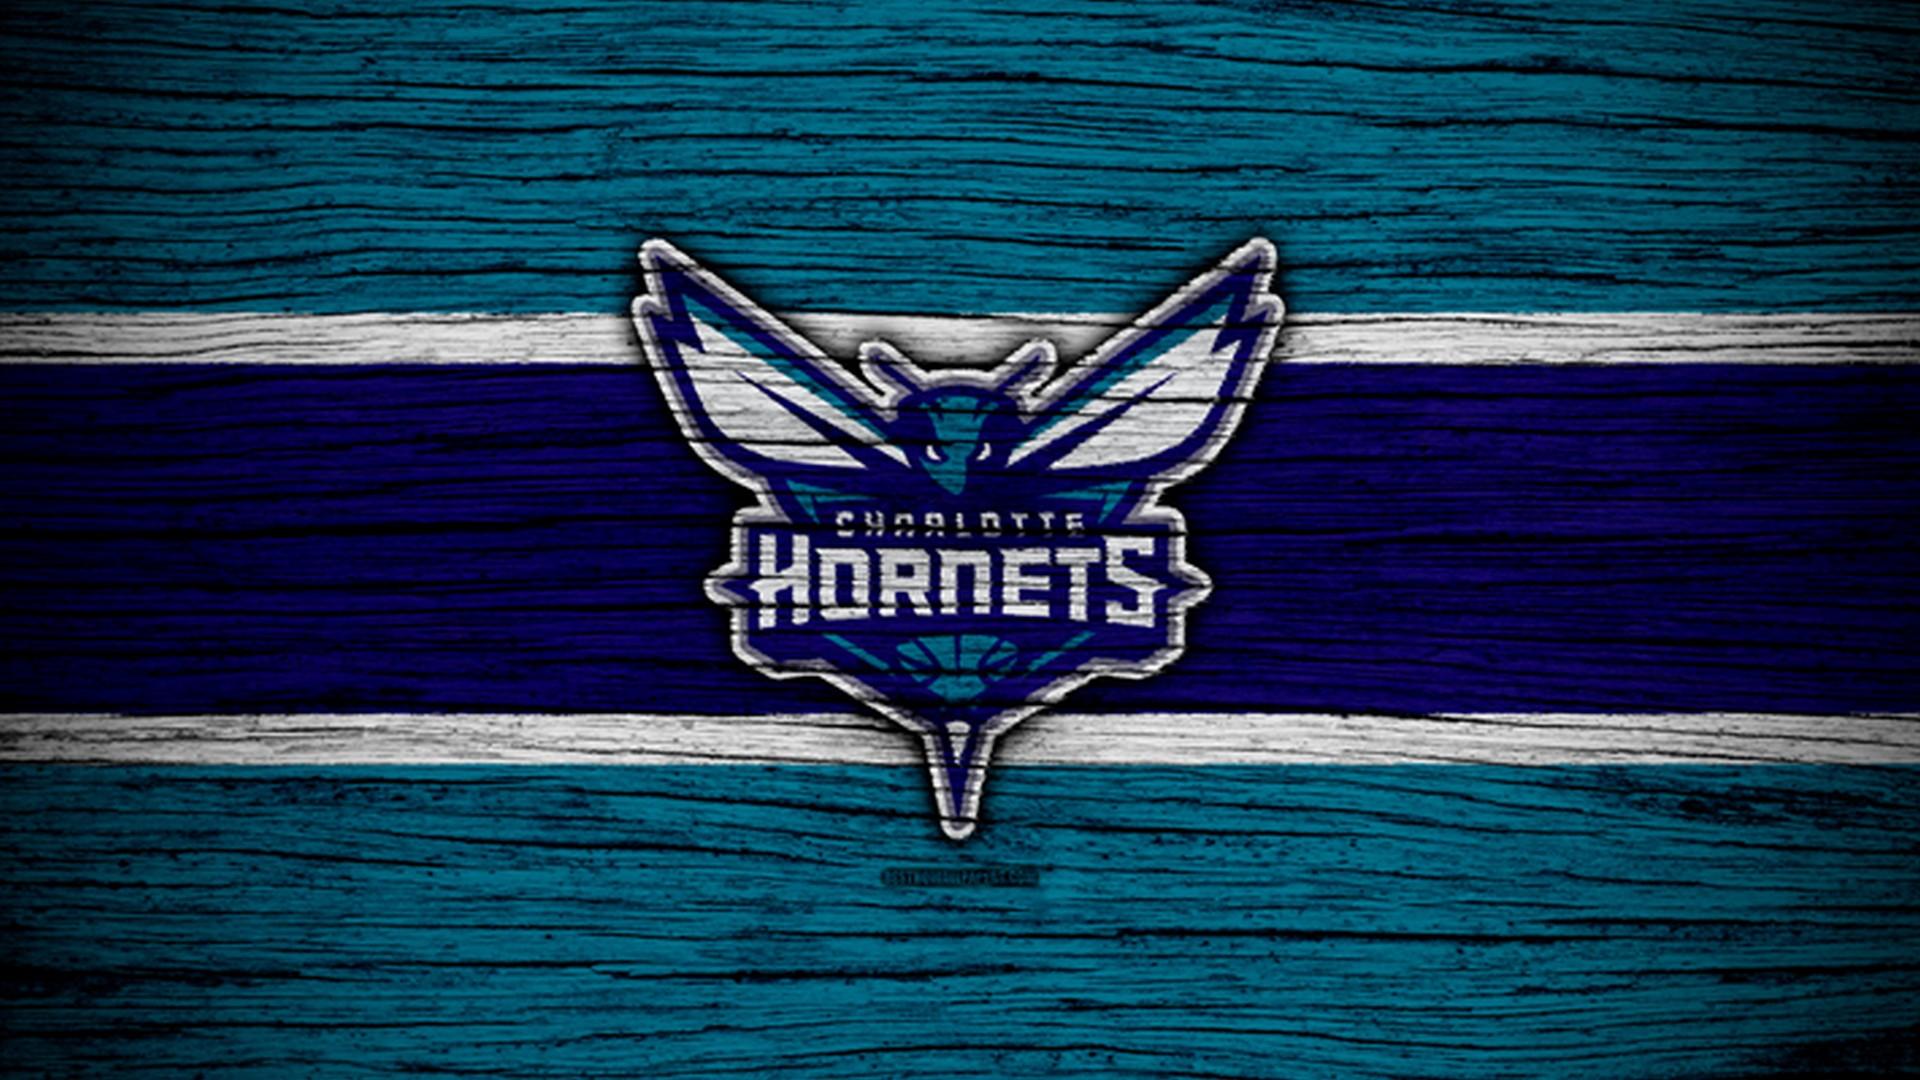 HD Charlotte Hornets Wallpapers 2019 Basketball Wallpaper 1920x1080